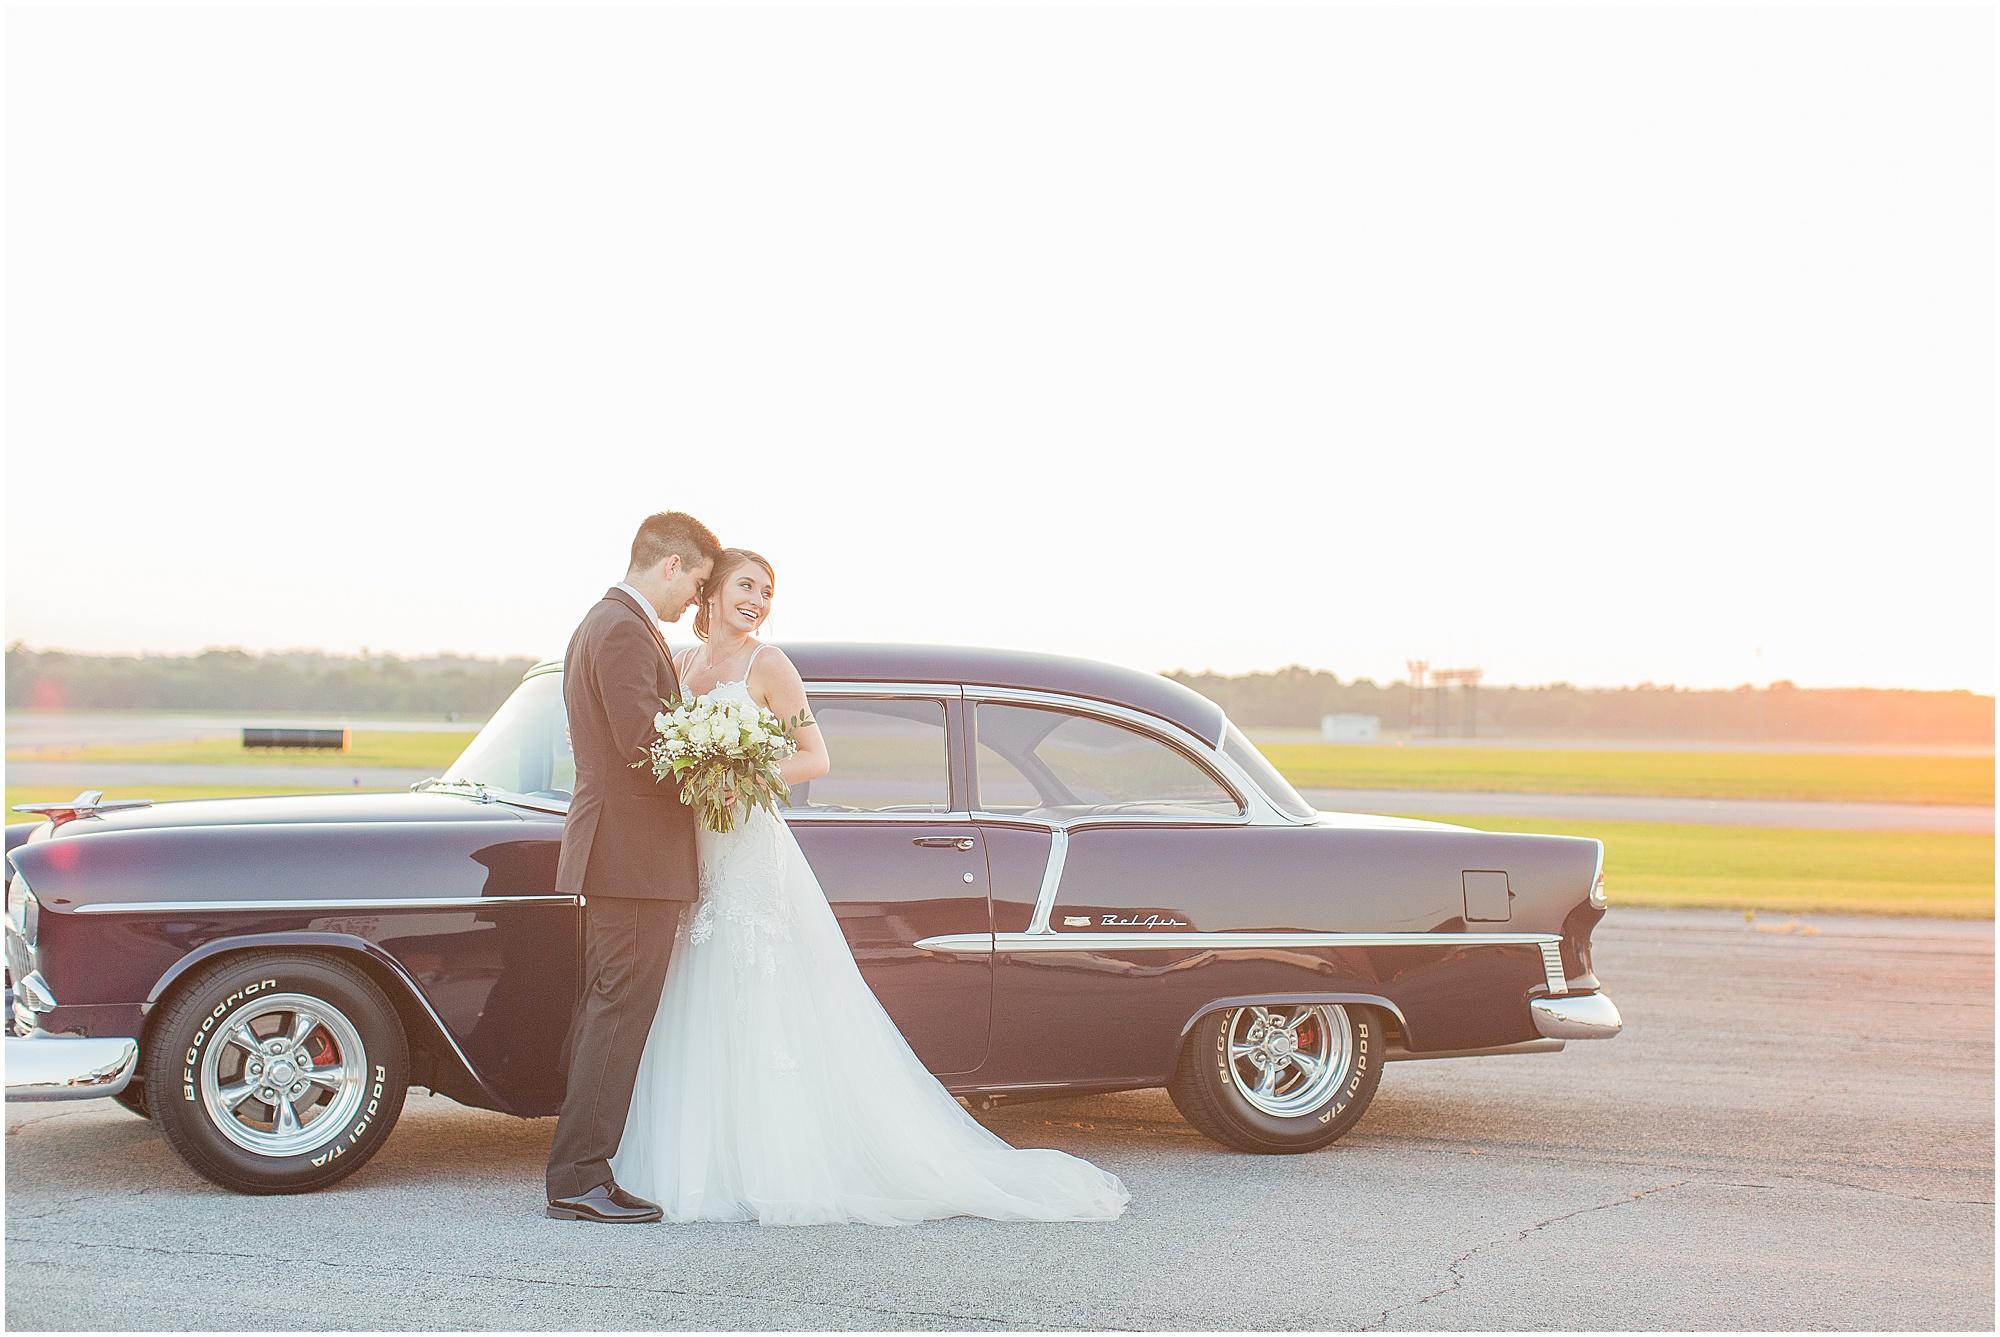 meridian-mississippi-wedding-meridian-aviation_0083.jpg